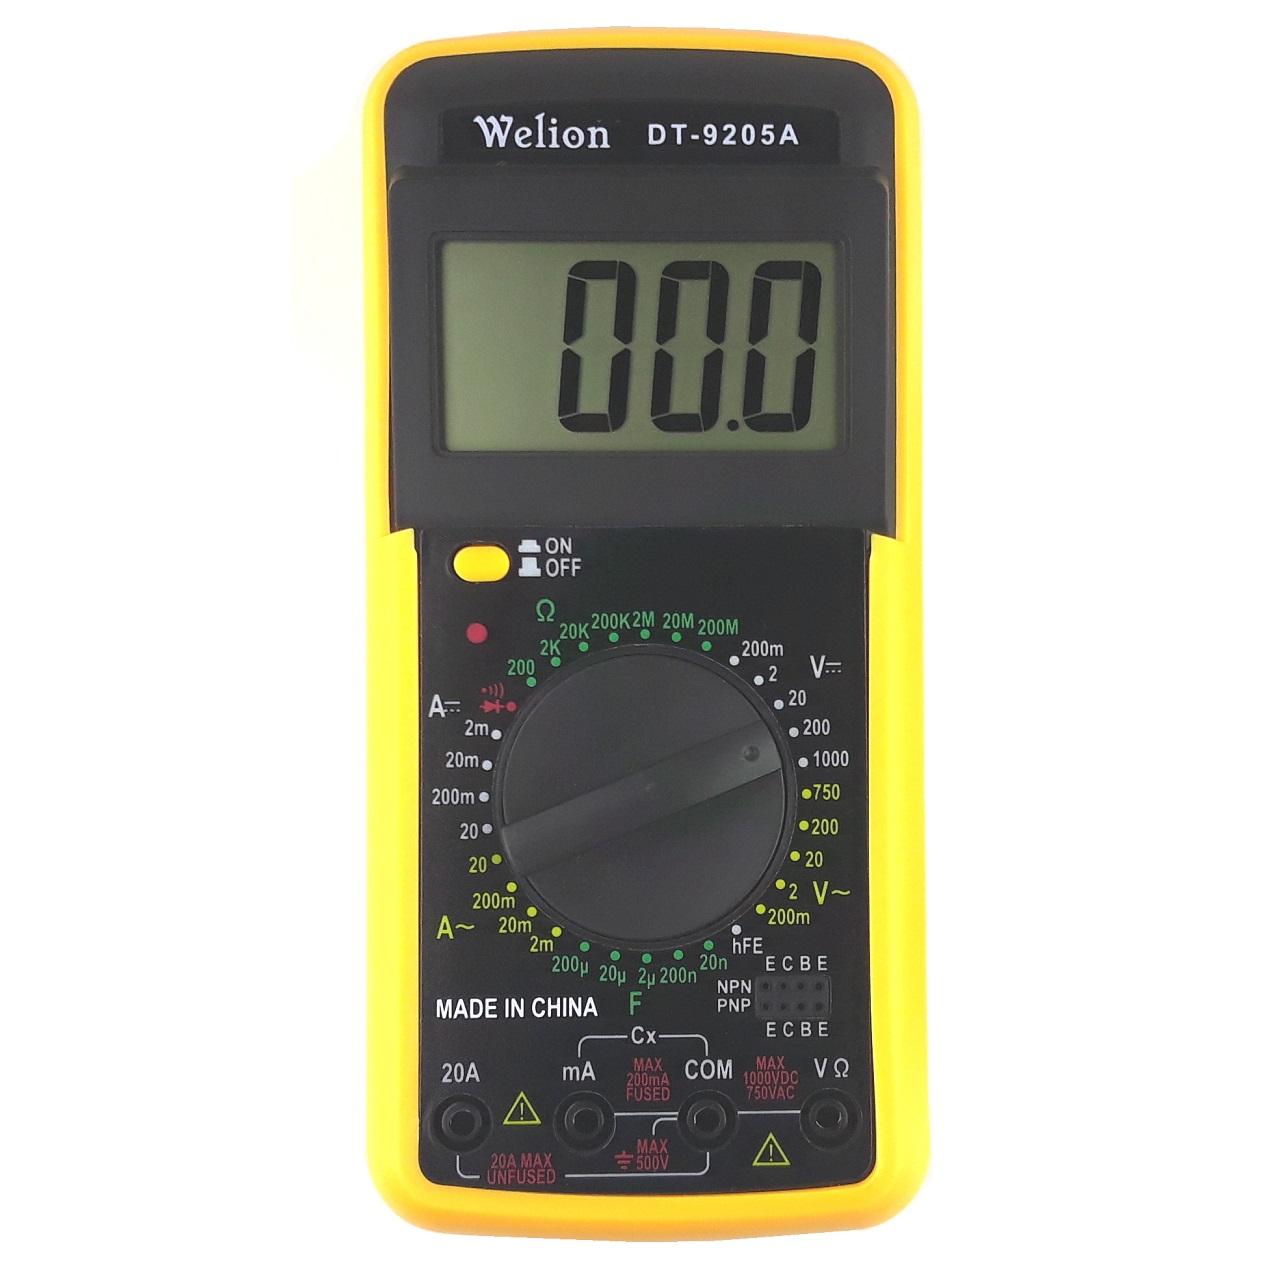 مولتی متر دیجیتال  ویلیون مدل DT-9205A